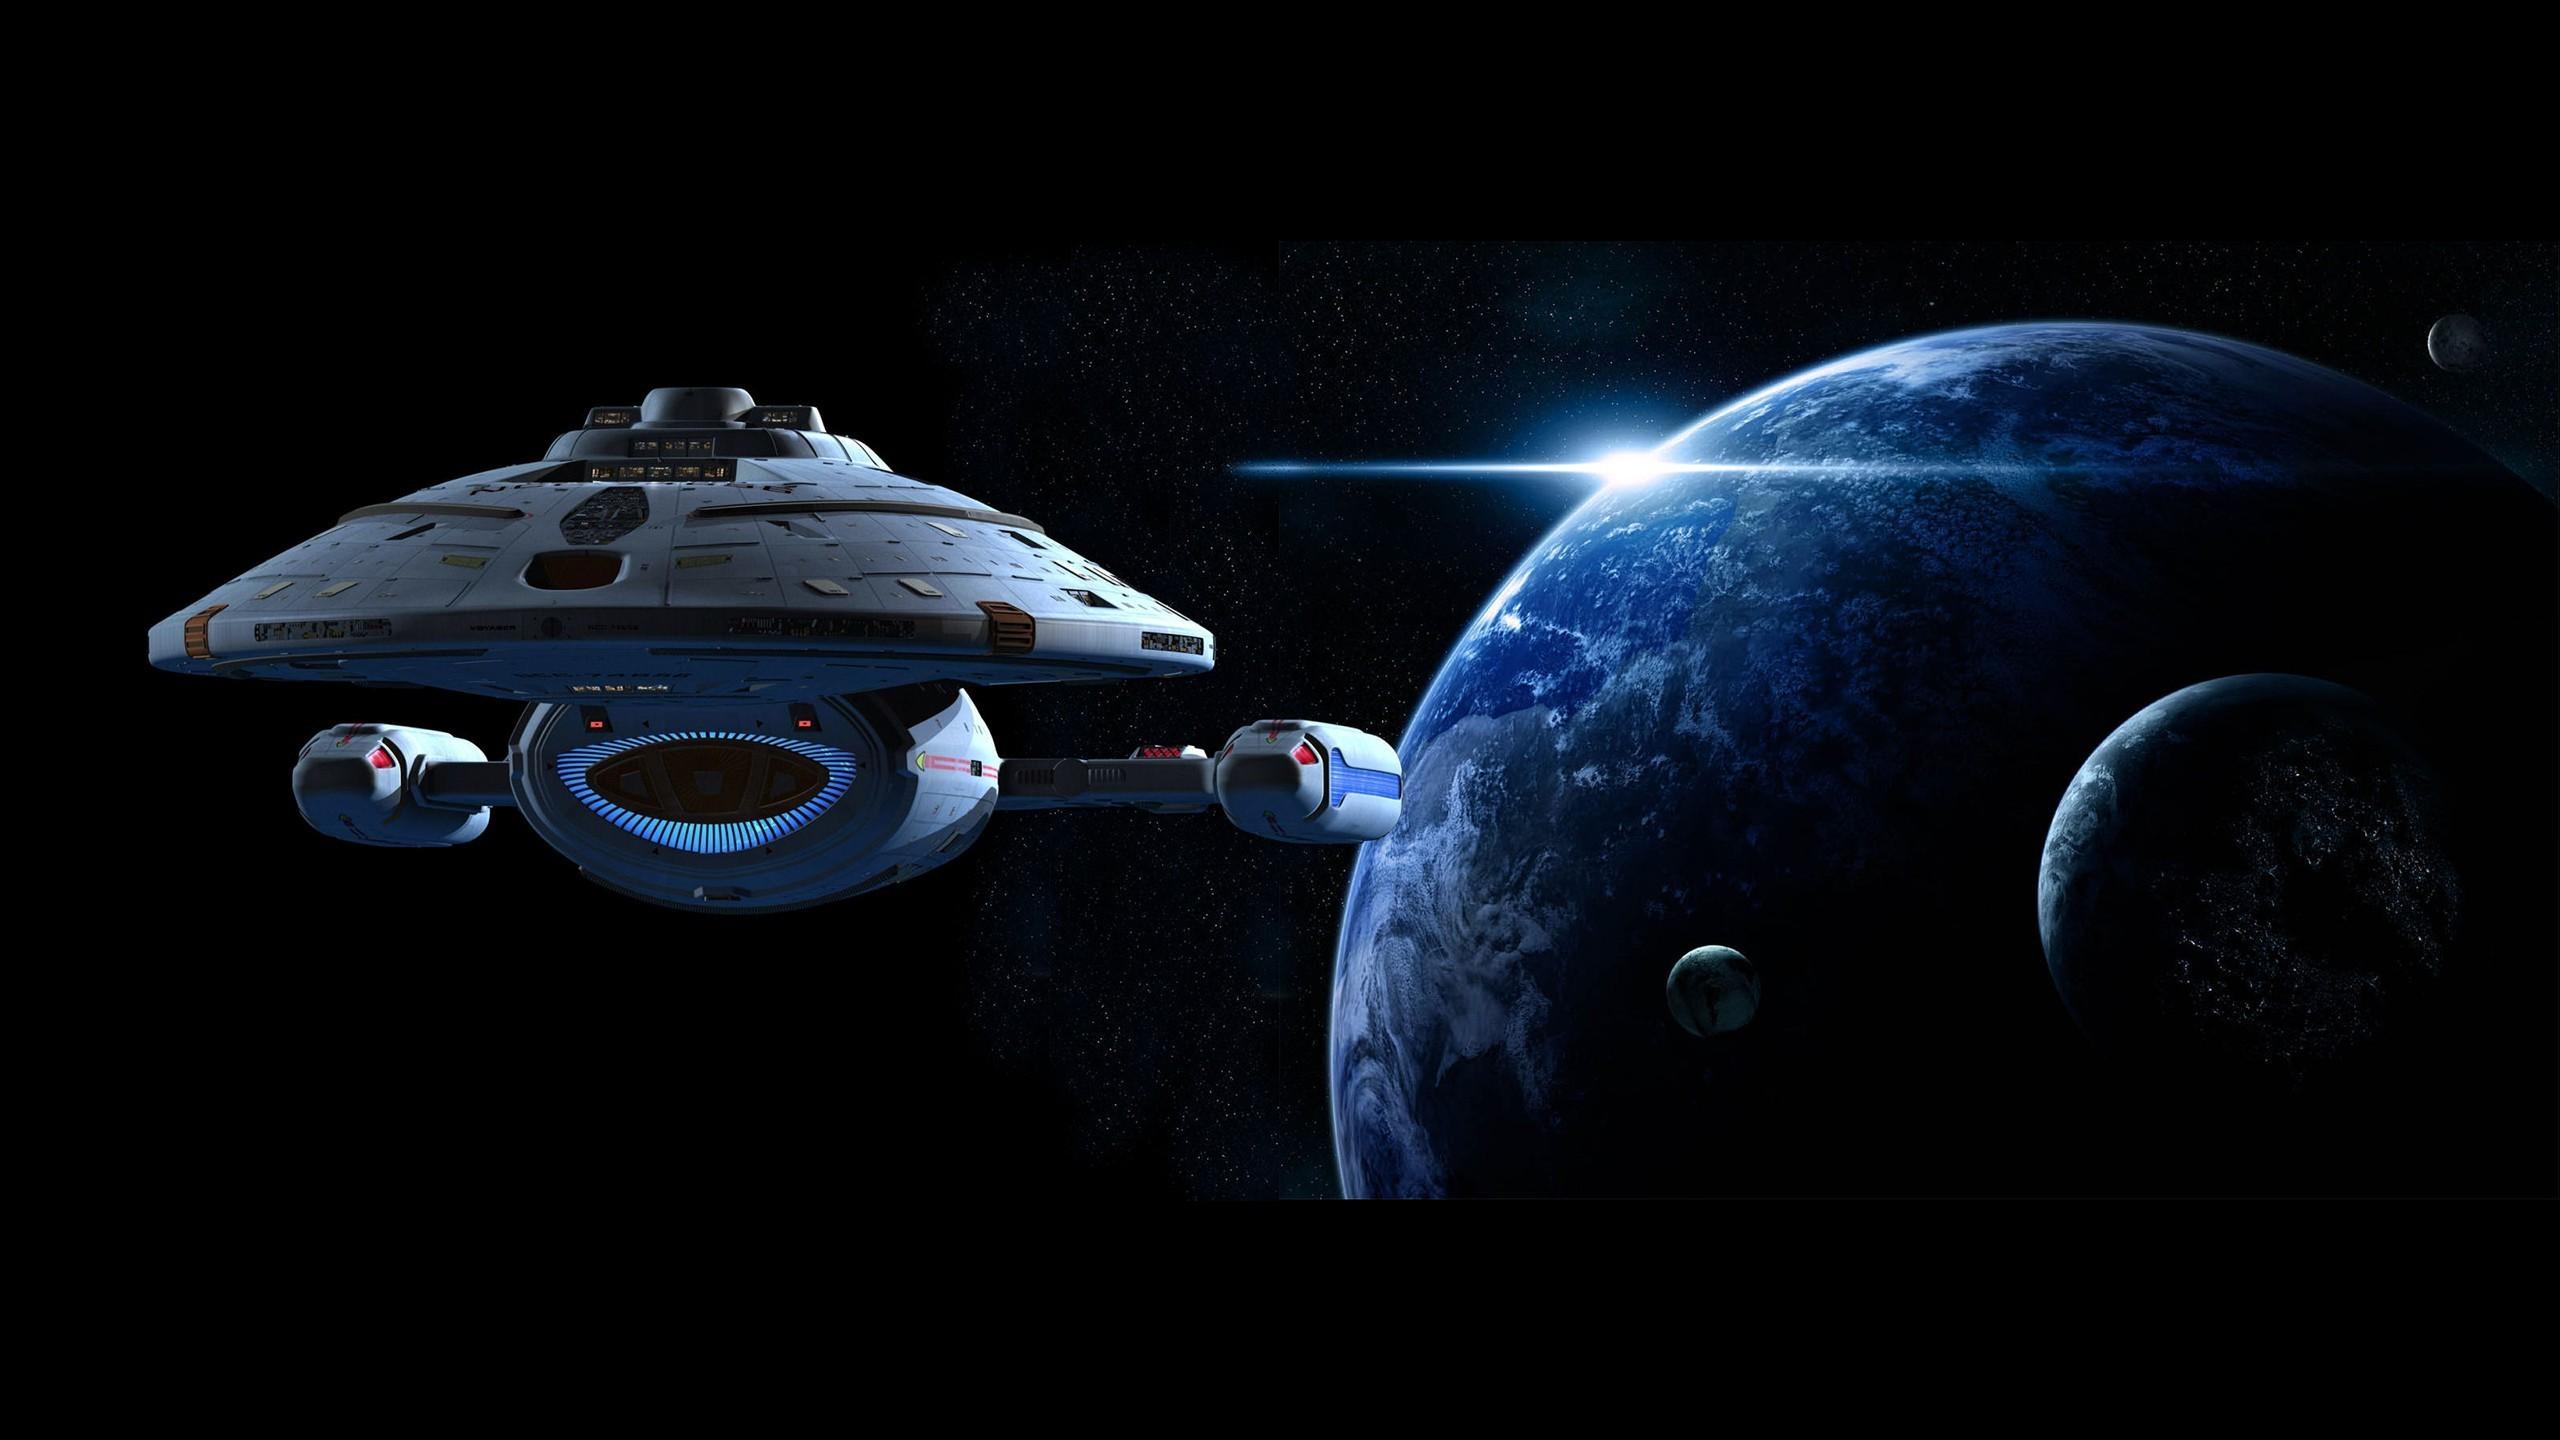 Star Trek, Space, Planet, Star Trek Voyager Wallpapers HD / Desktop and  Mobile Backgrounds